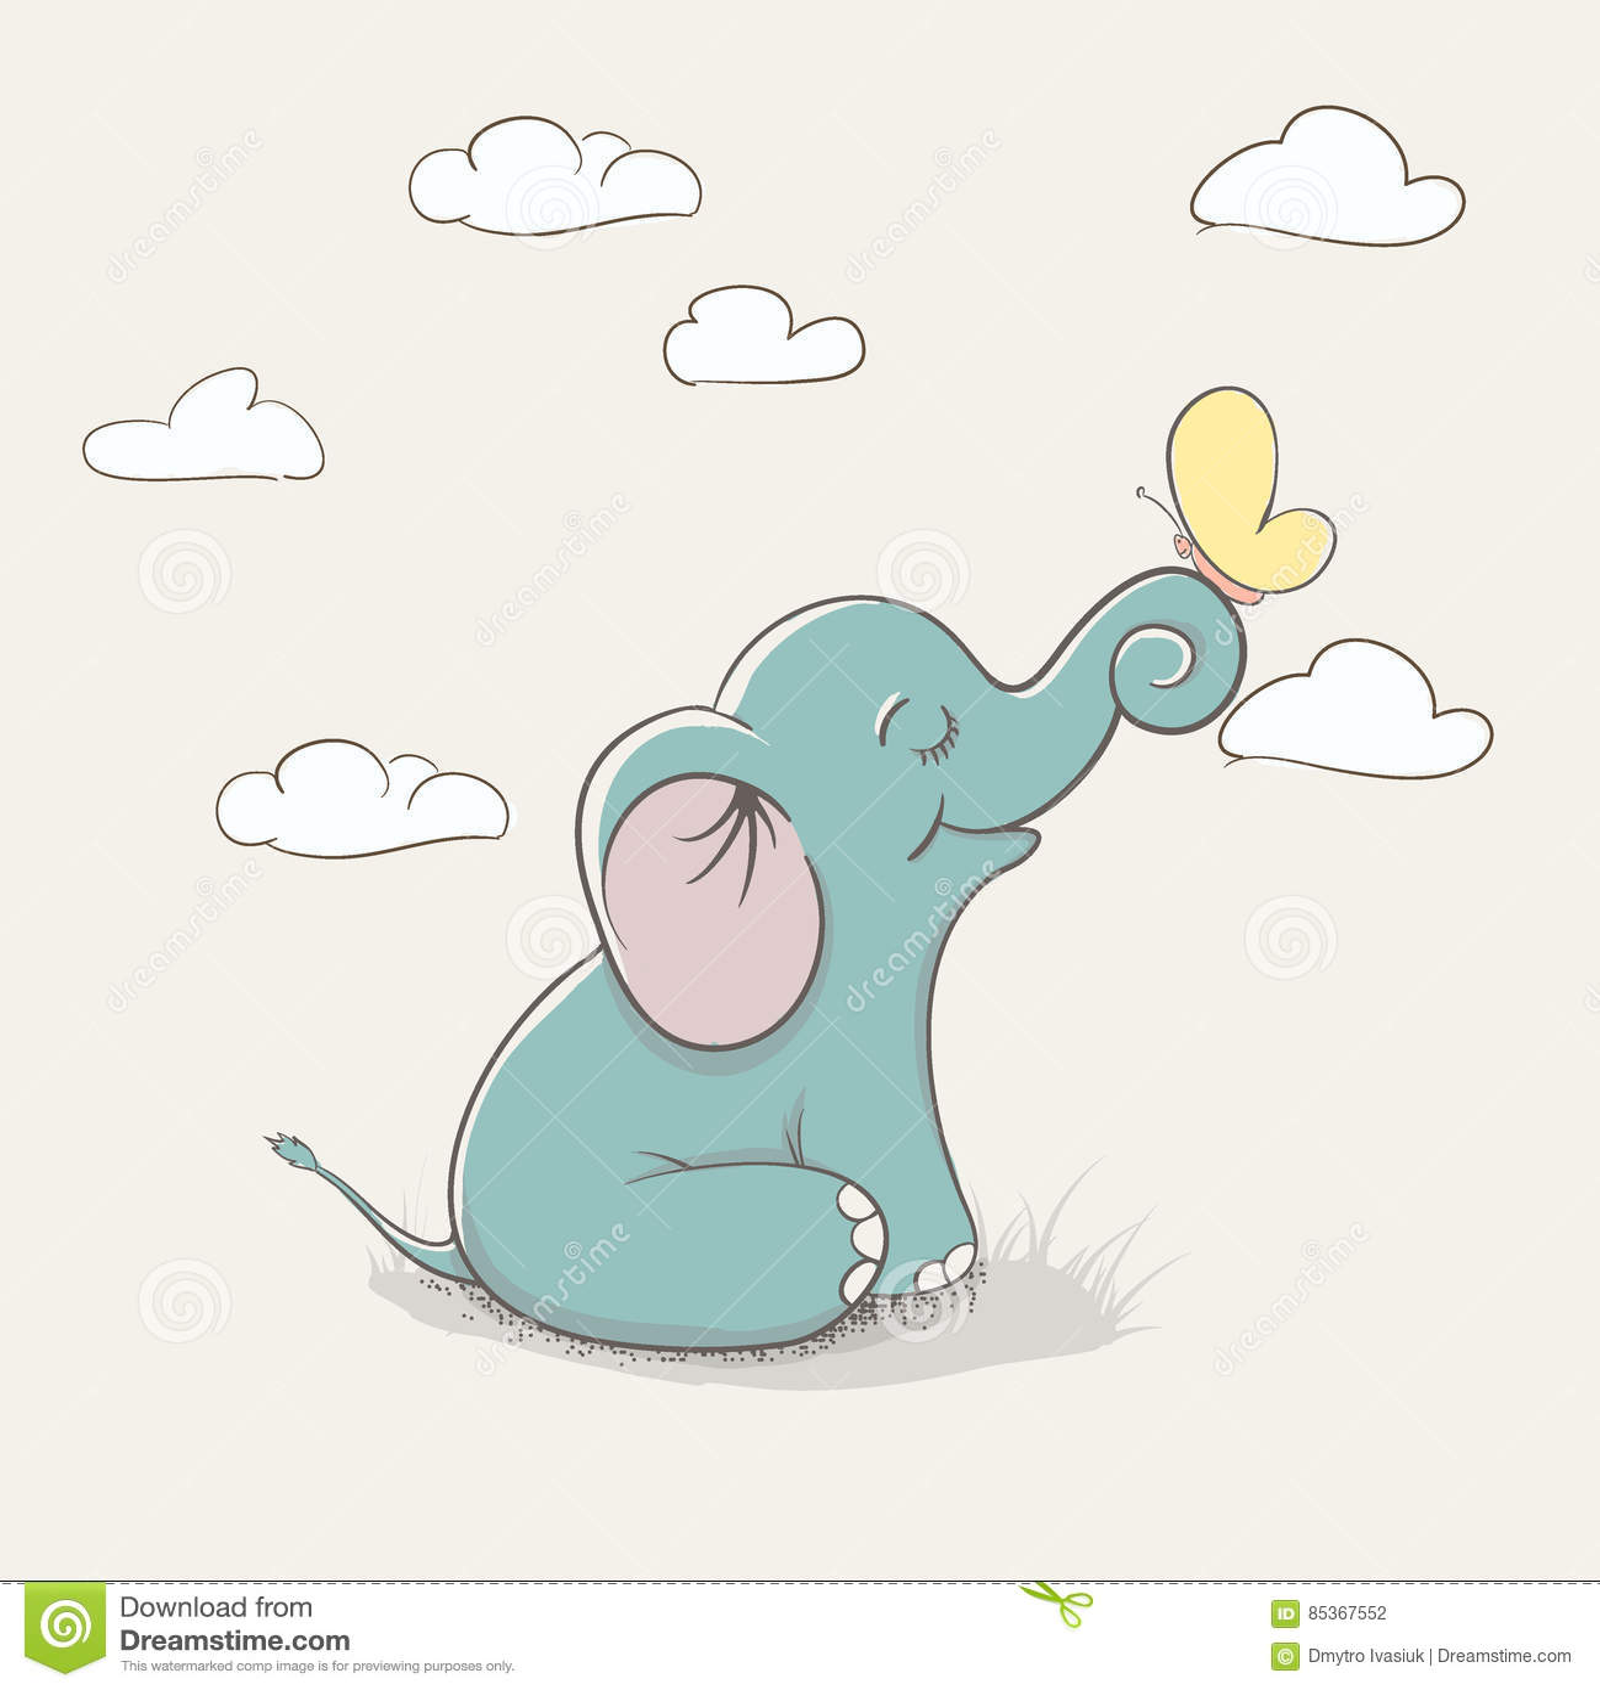 Cartoon Child Elephant Stock Vector Illustration Of Cute 85367552